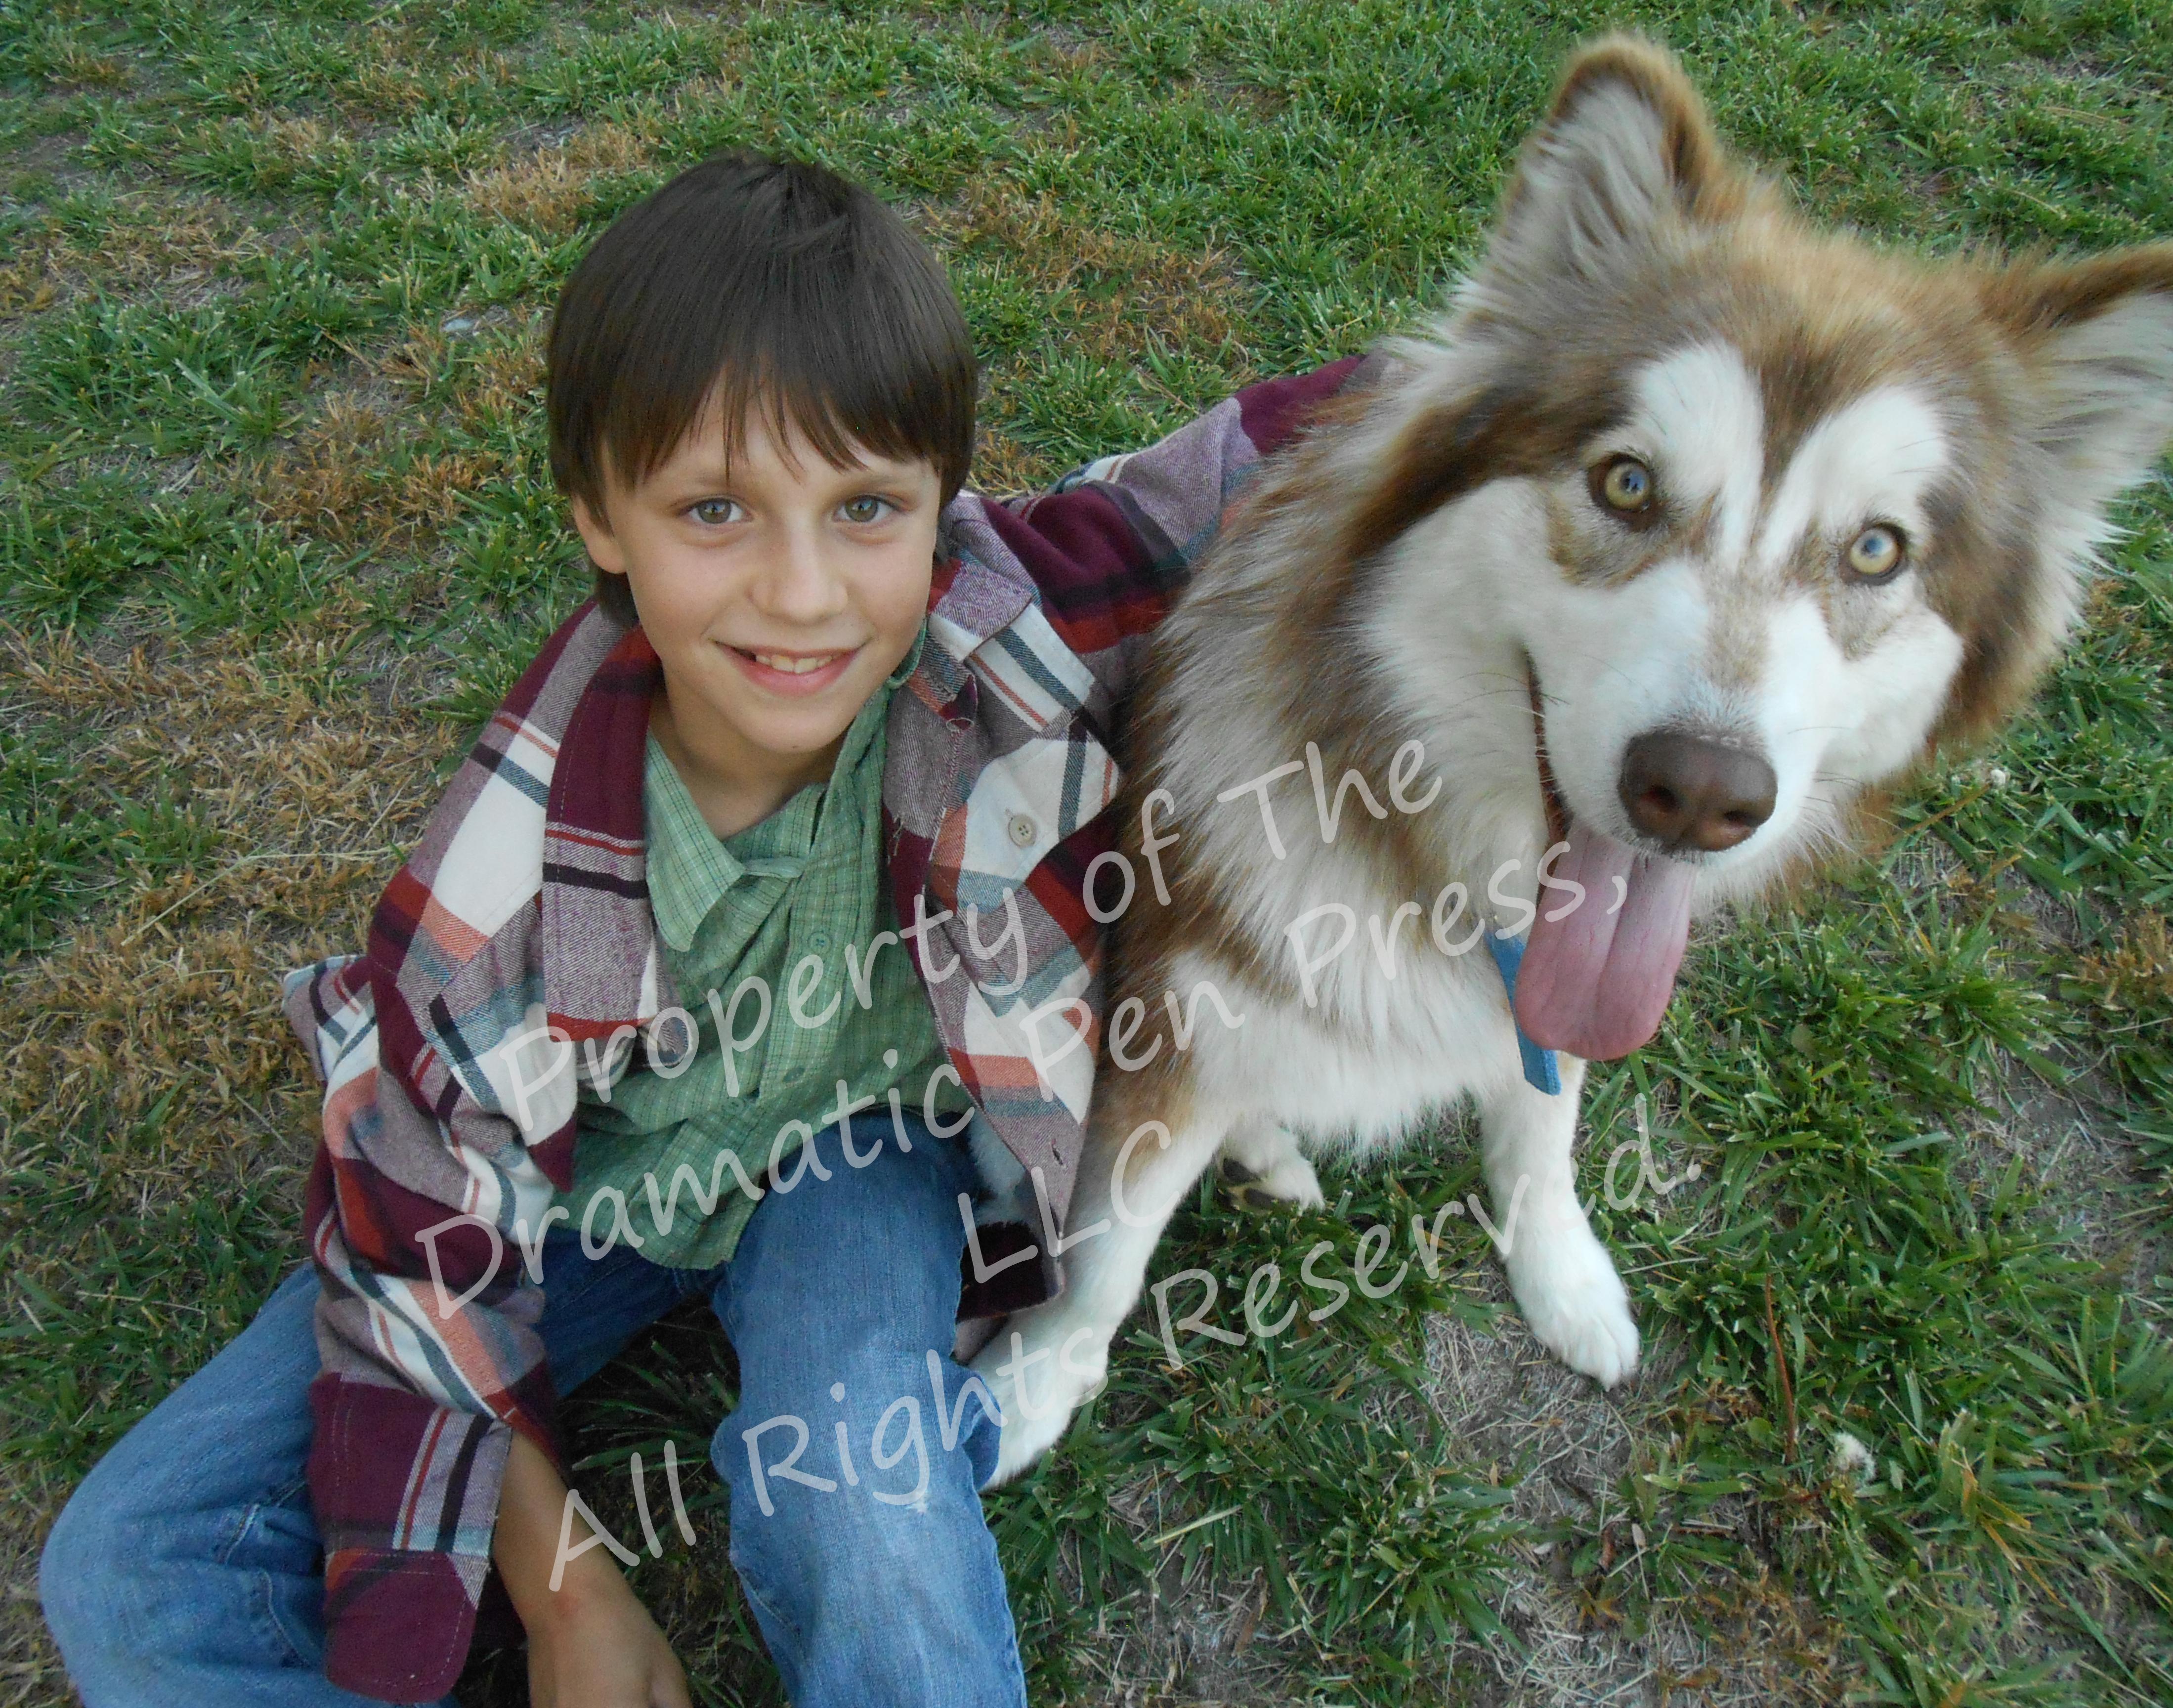 Smiling Boy Sitting with Dog